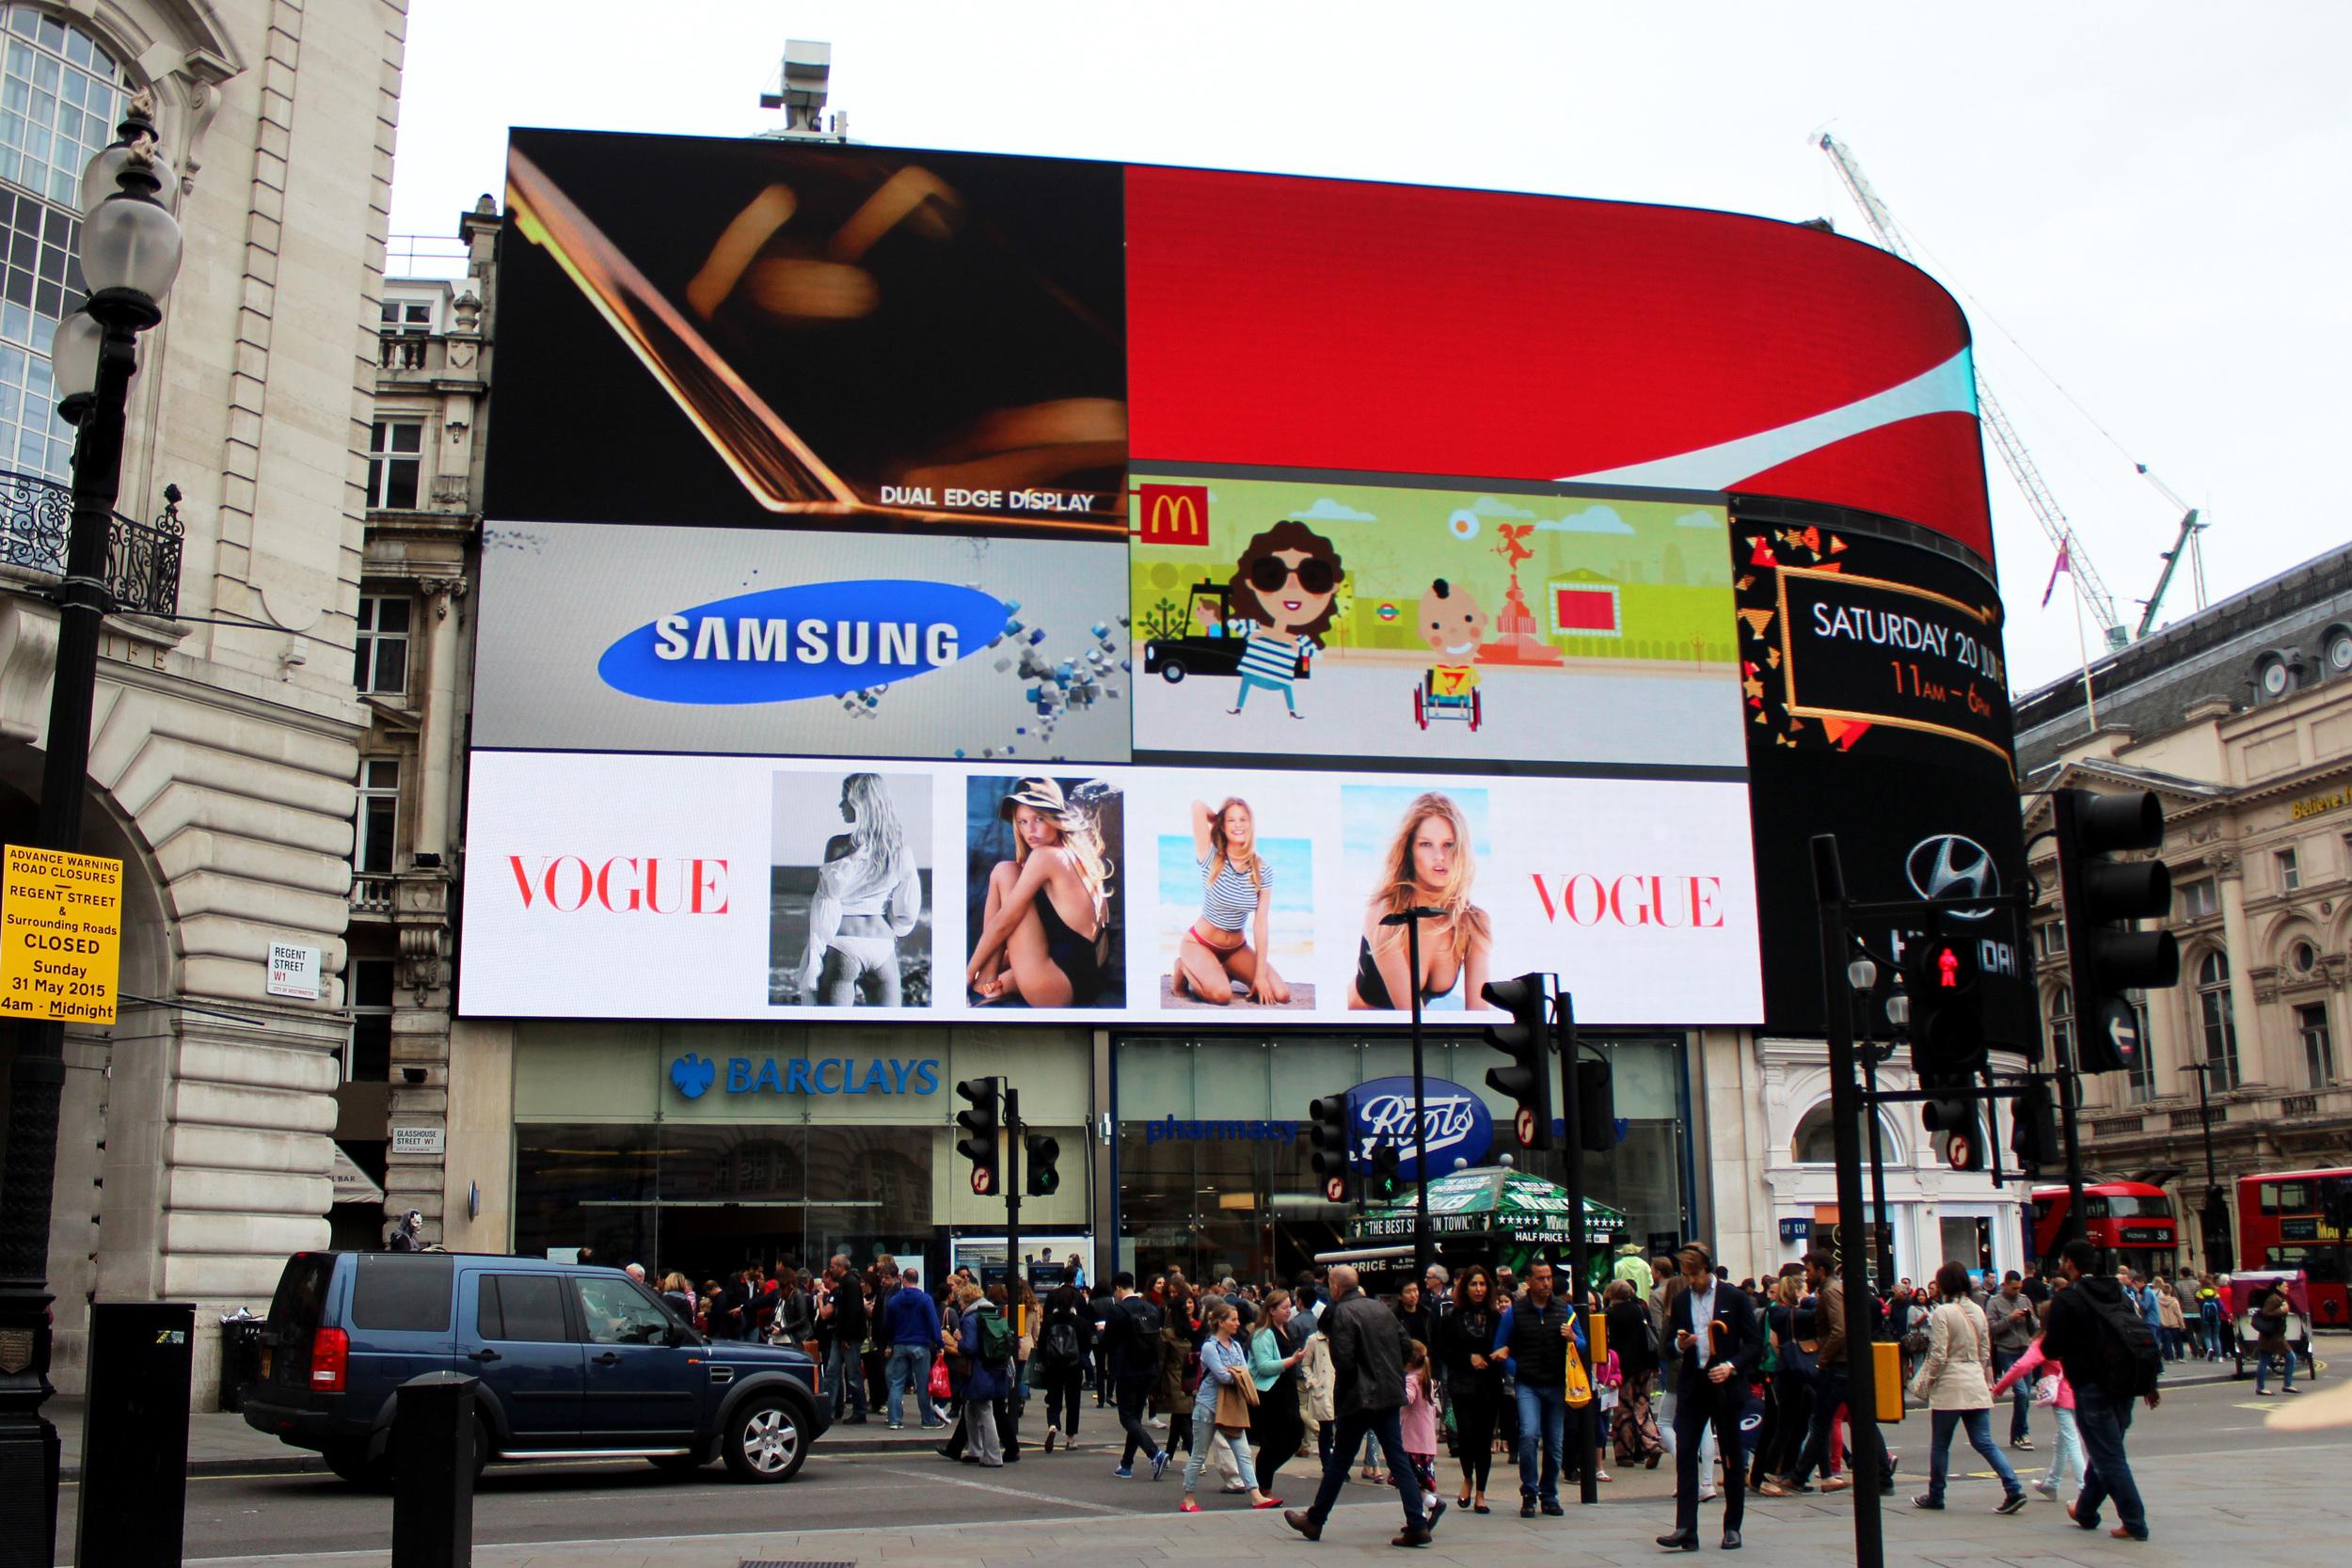 British VBritish Vogue, Piccadilly Circusogue, Piccadilly Circus